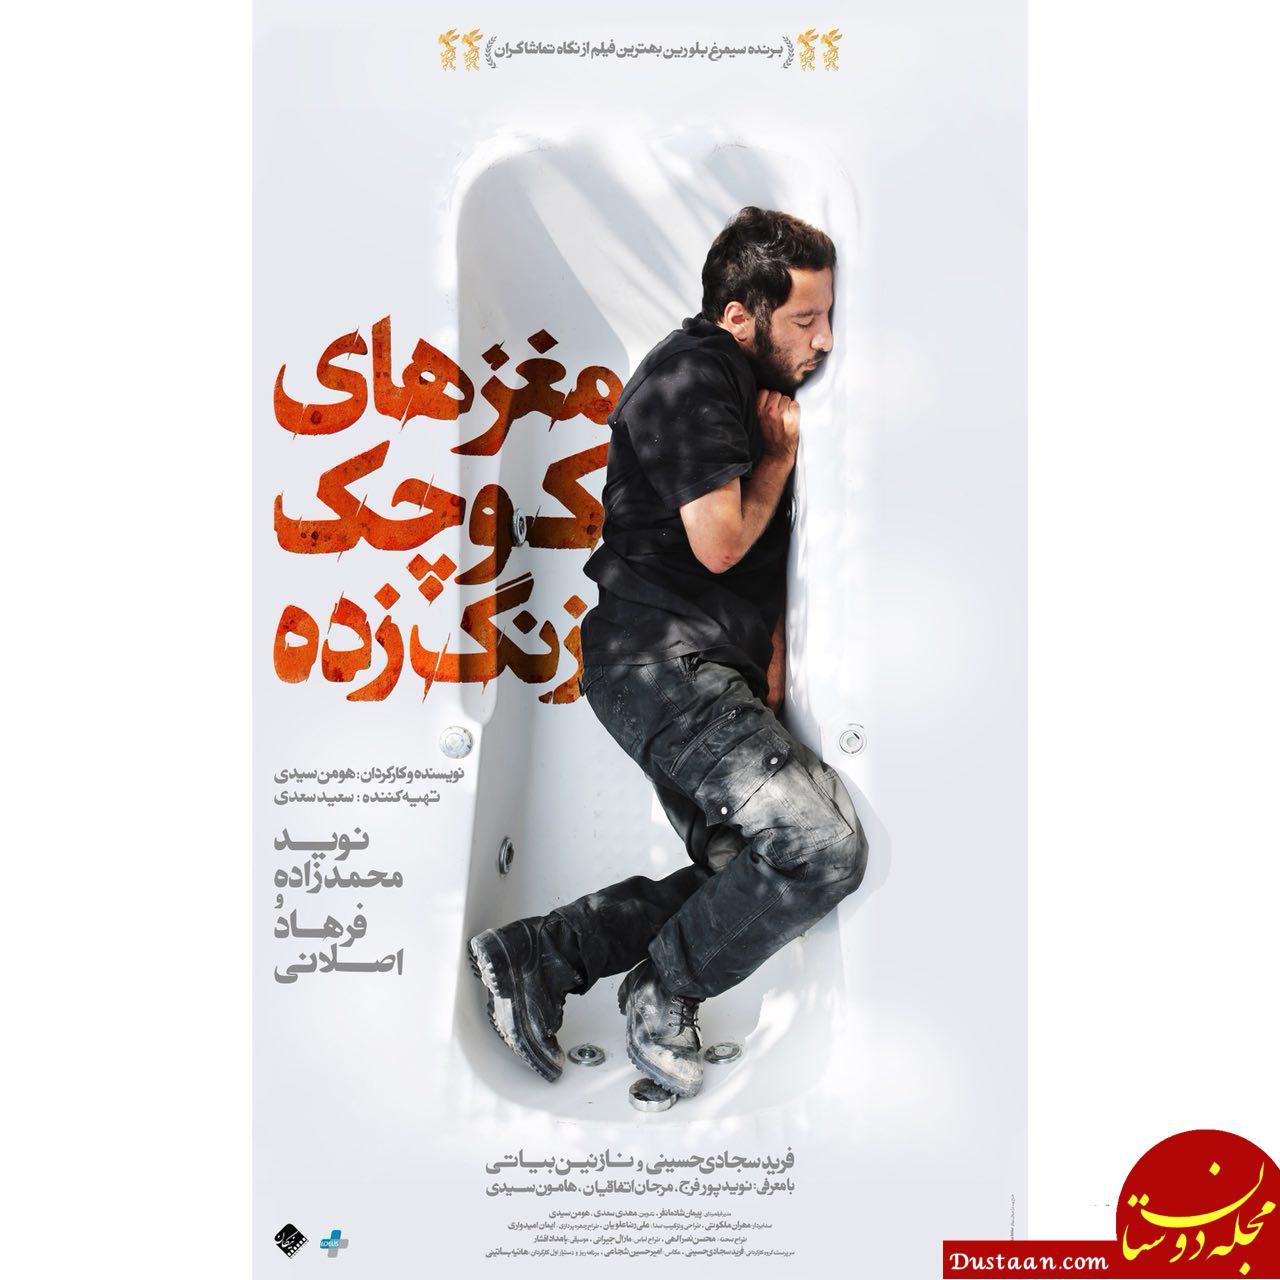 www.dustaan.com رونمایی از پوستر «مغزهای کوچک زنگ زده»